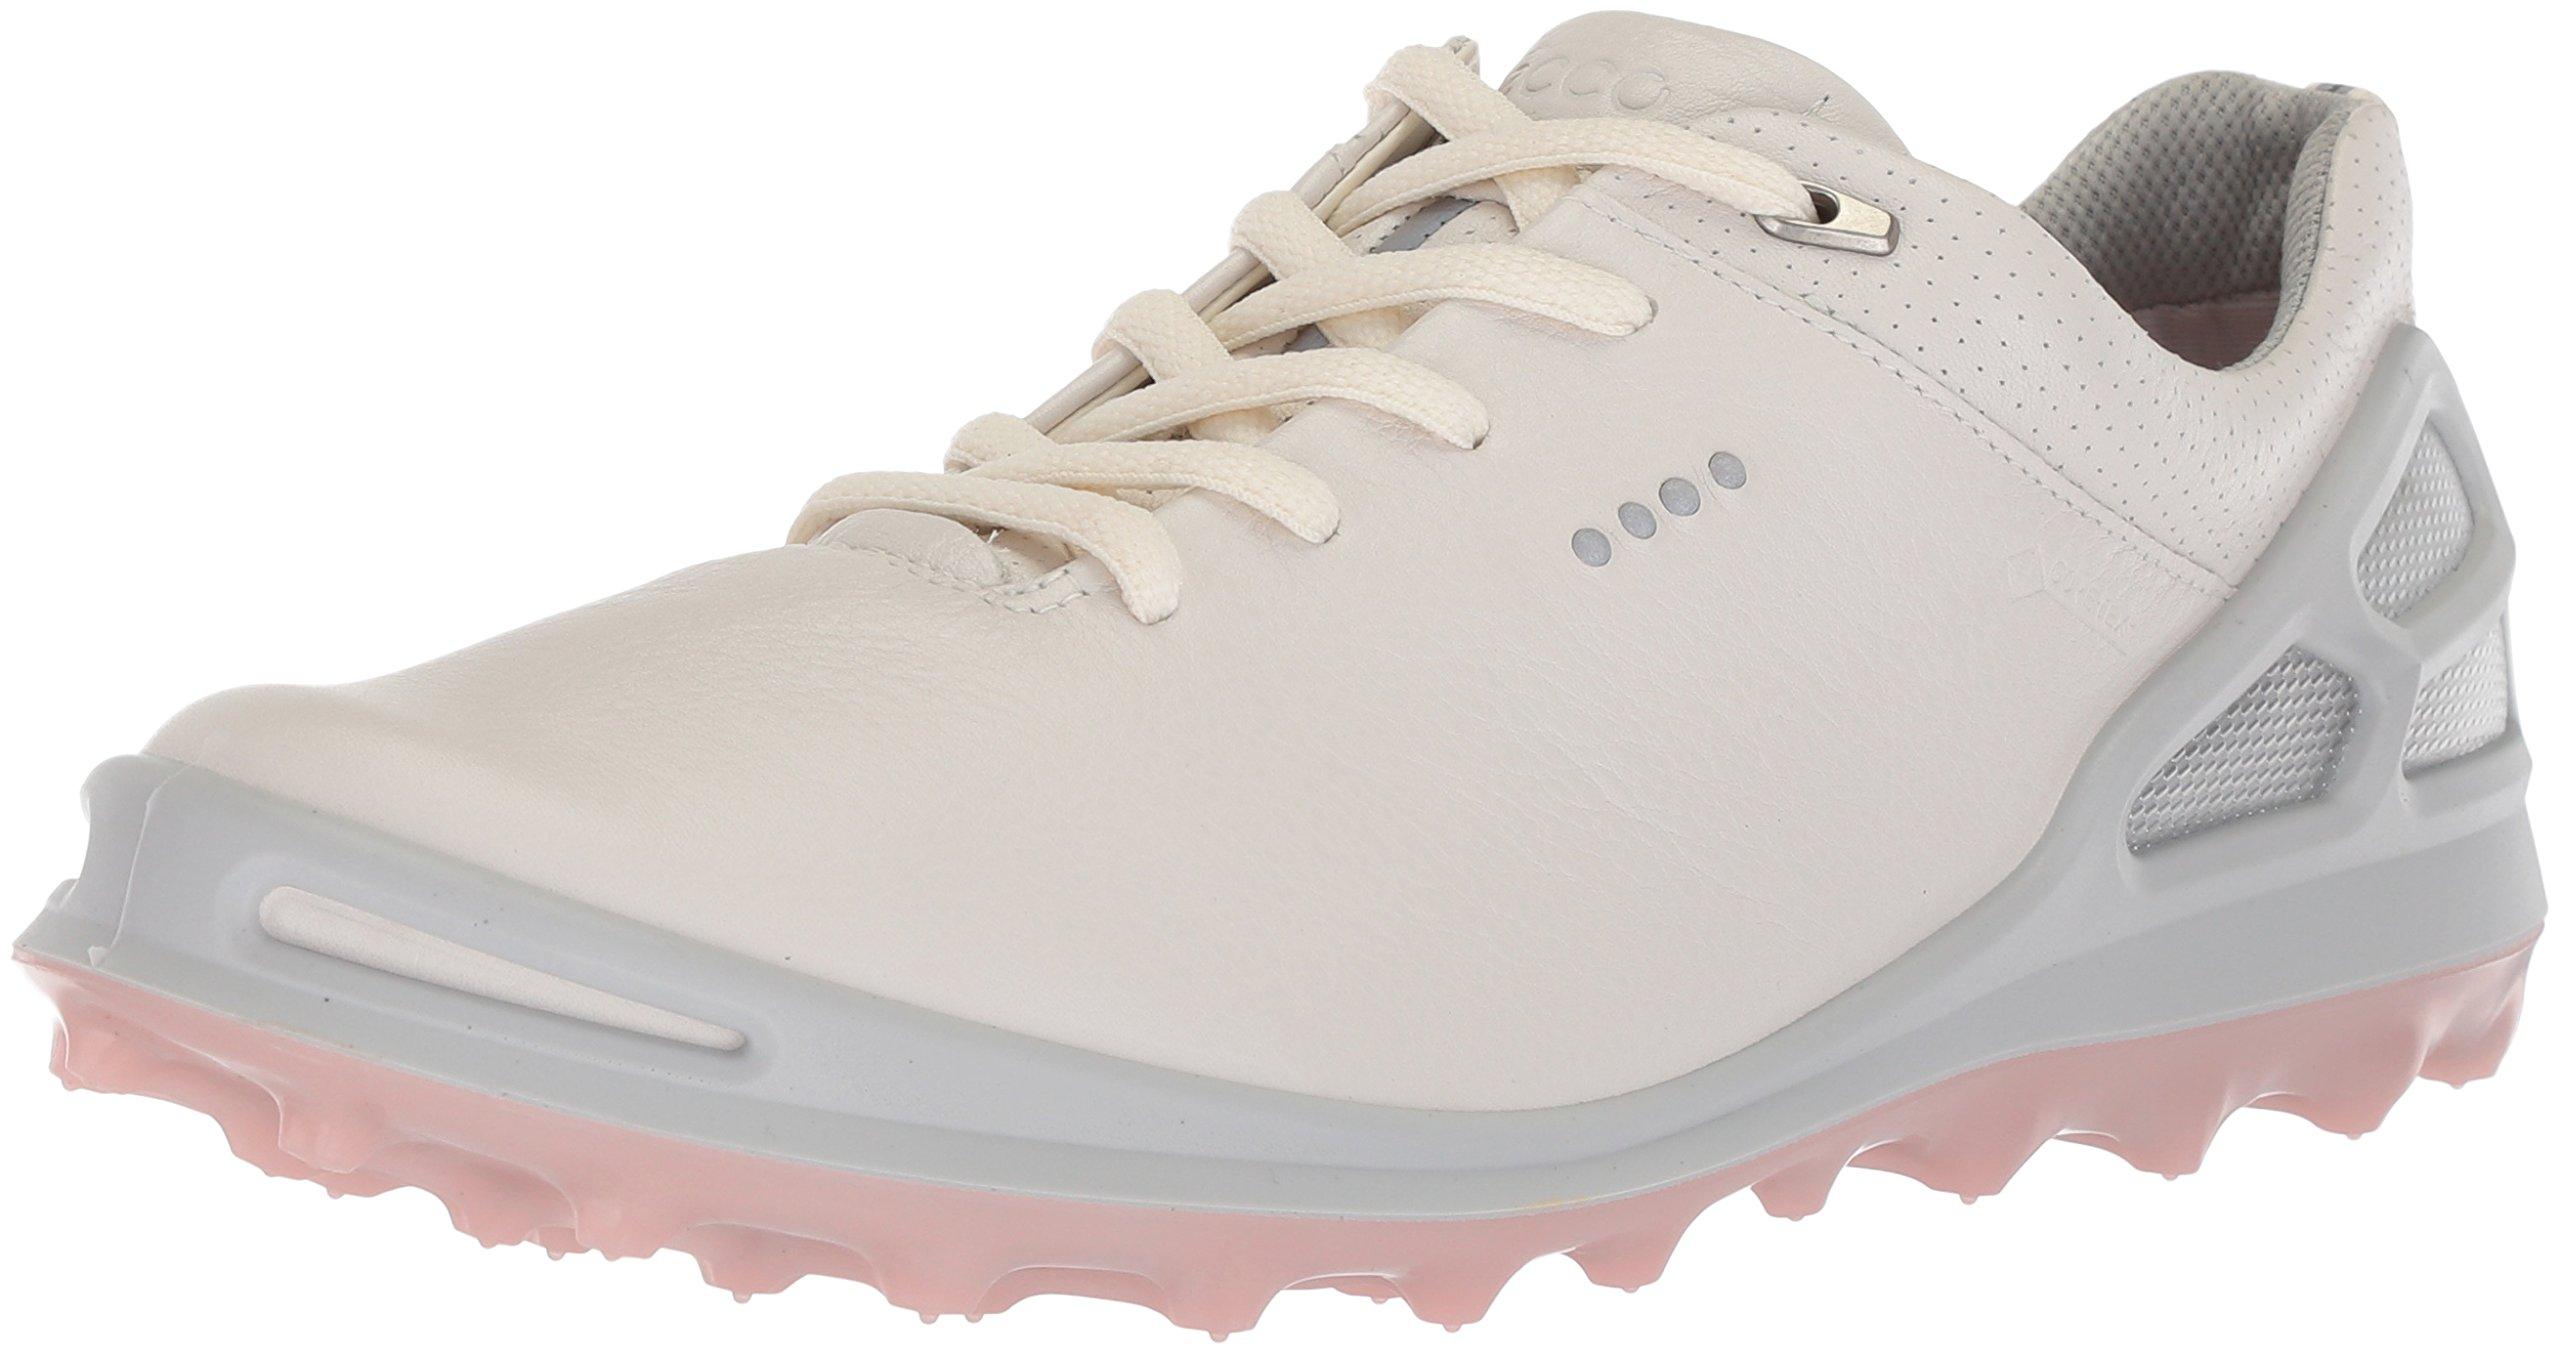 ECCO Women's Cage Pro Gore-Tex Golf Shoe, White/Silver Pink, 8 M US by ECCO